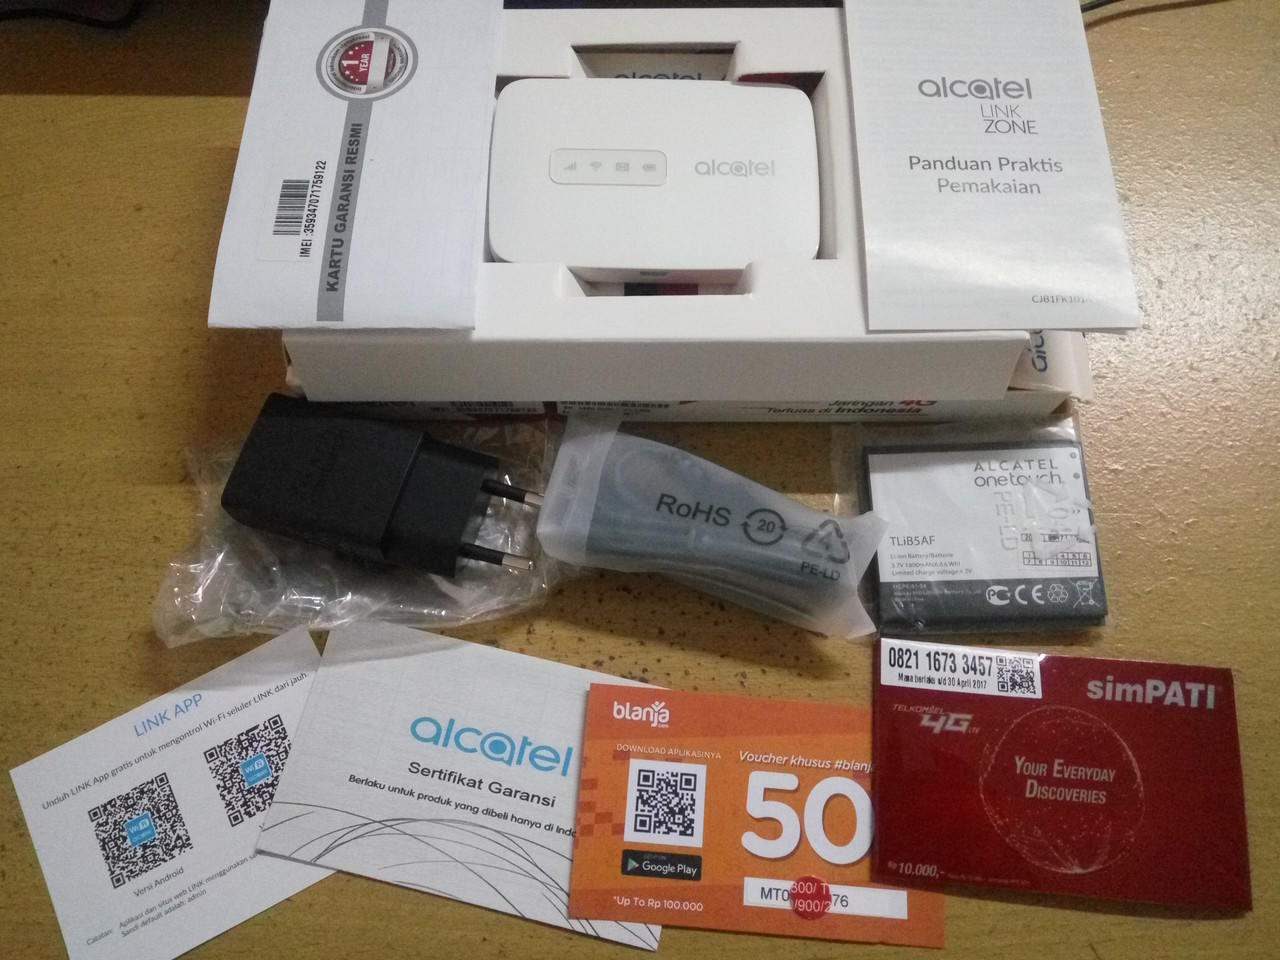 Mifi Alcatel Mw40 Free Telkomsel 14gb Unlock Handal Jaringan 4g Router Modem Wifi Huawei E5573 Bypass Tsel Review Terlengkap